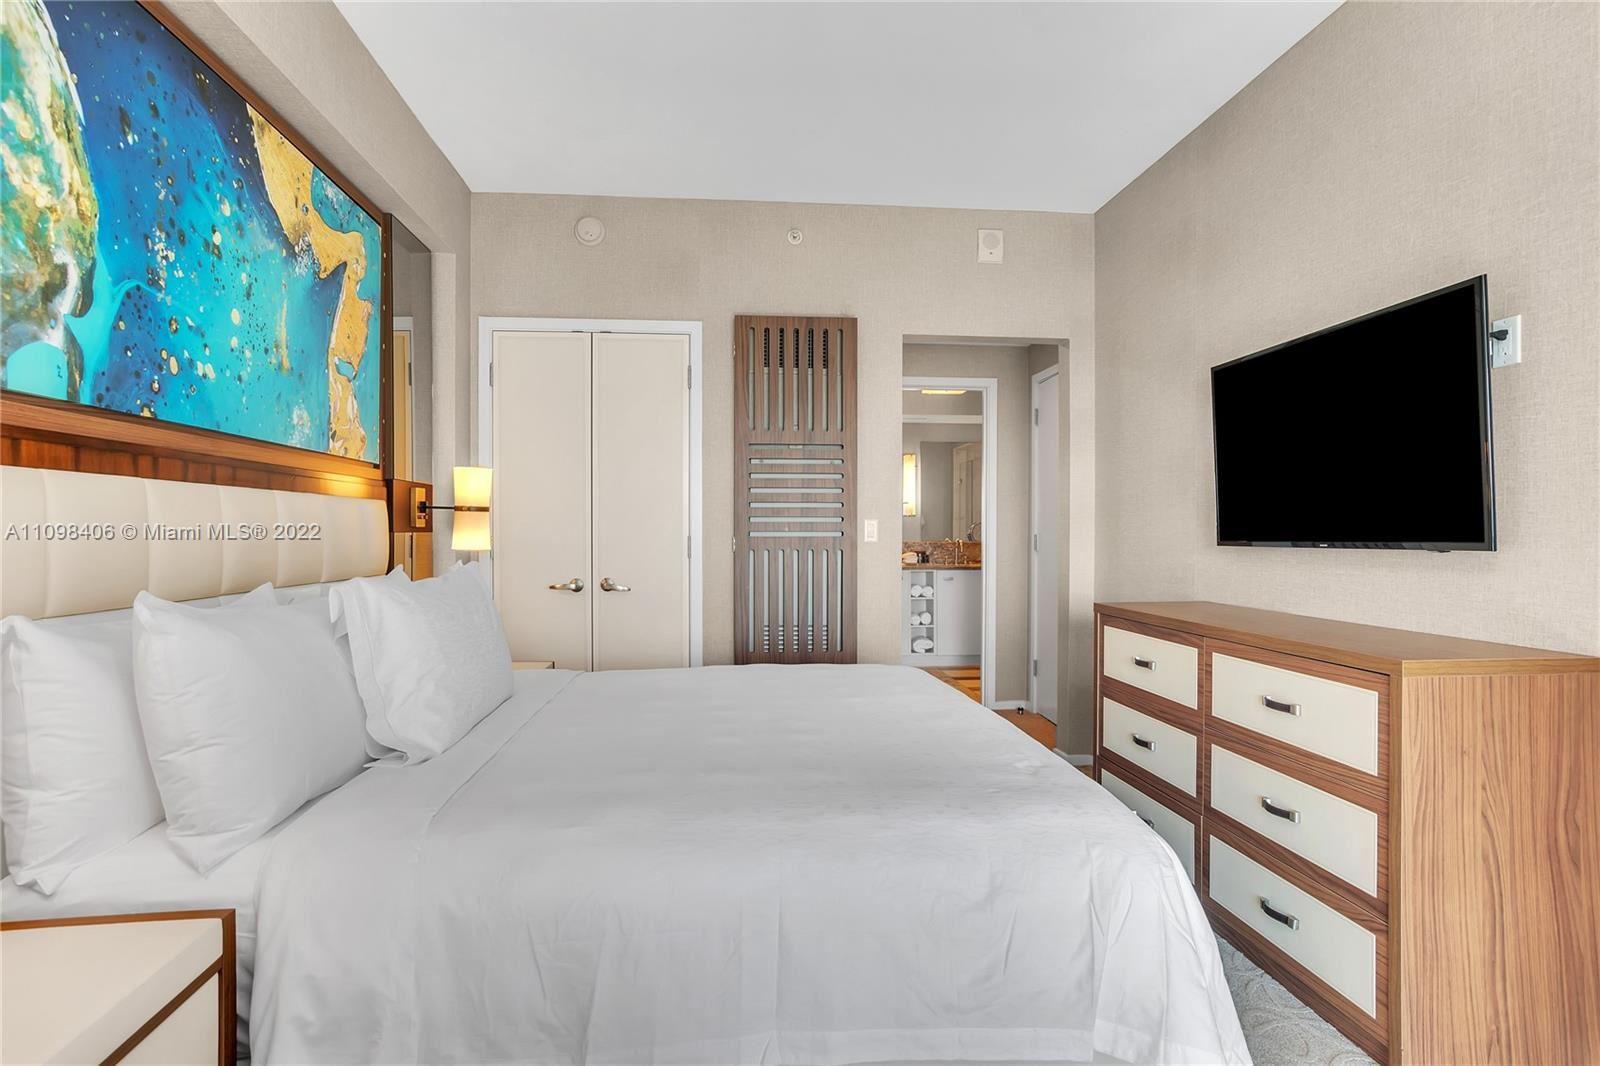 551 N Fort Lauderdale Beach Blv #H903, Fort Lauderdale, FL 33304 - #: A11098406